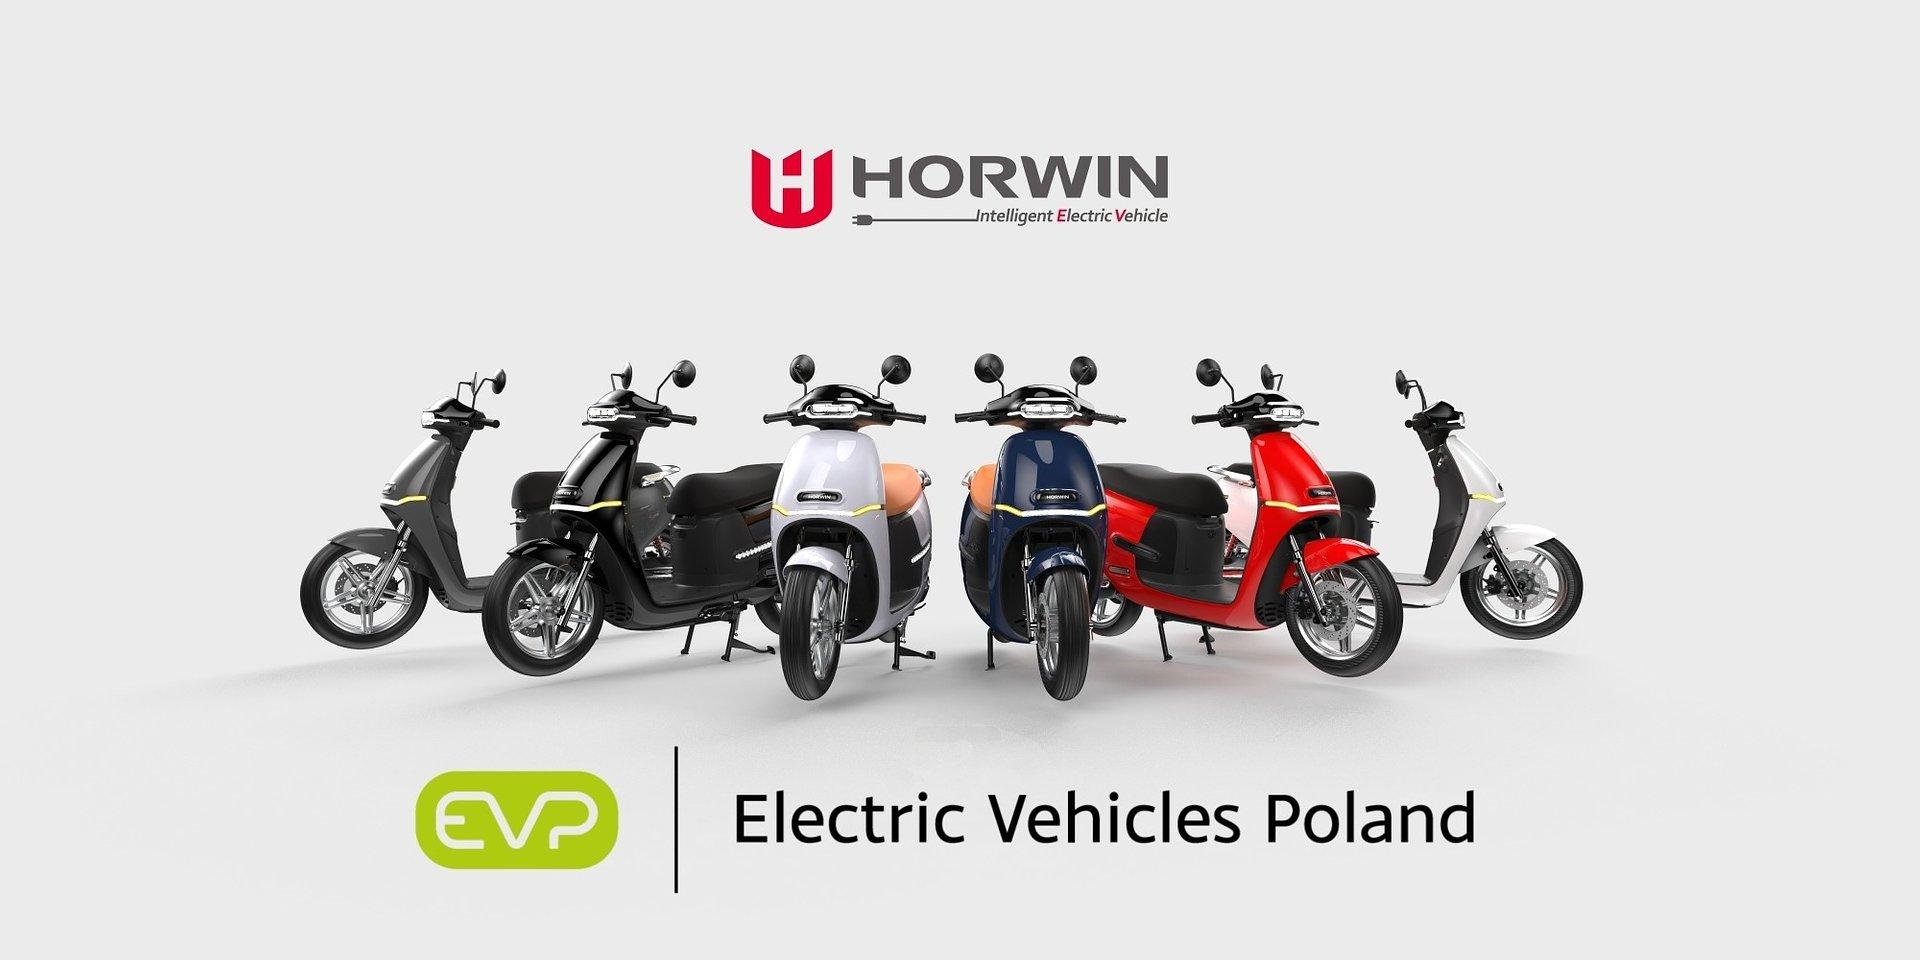 Electric Vehicles Poland partnerem marki HORWIN